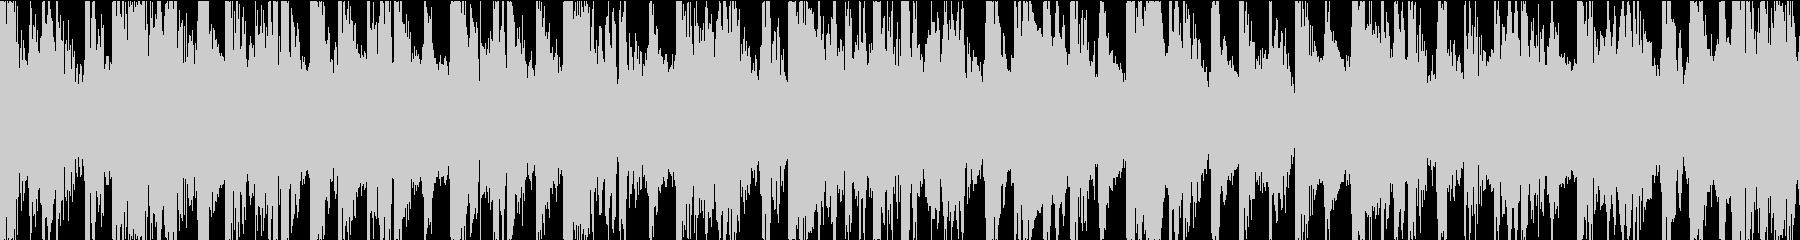 SE05 ダークの未再生の波形